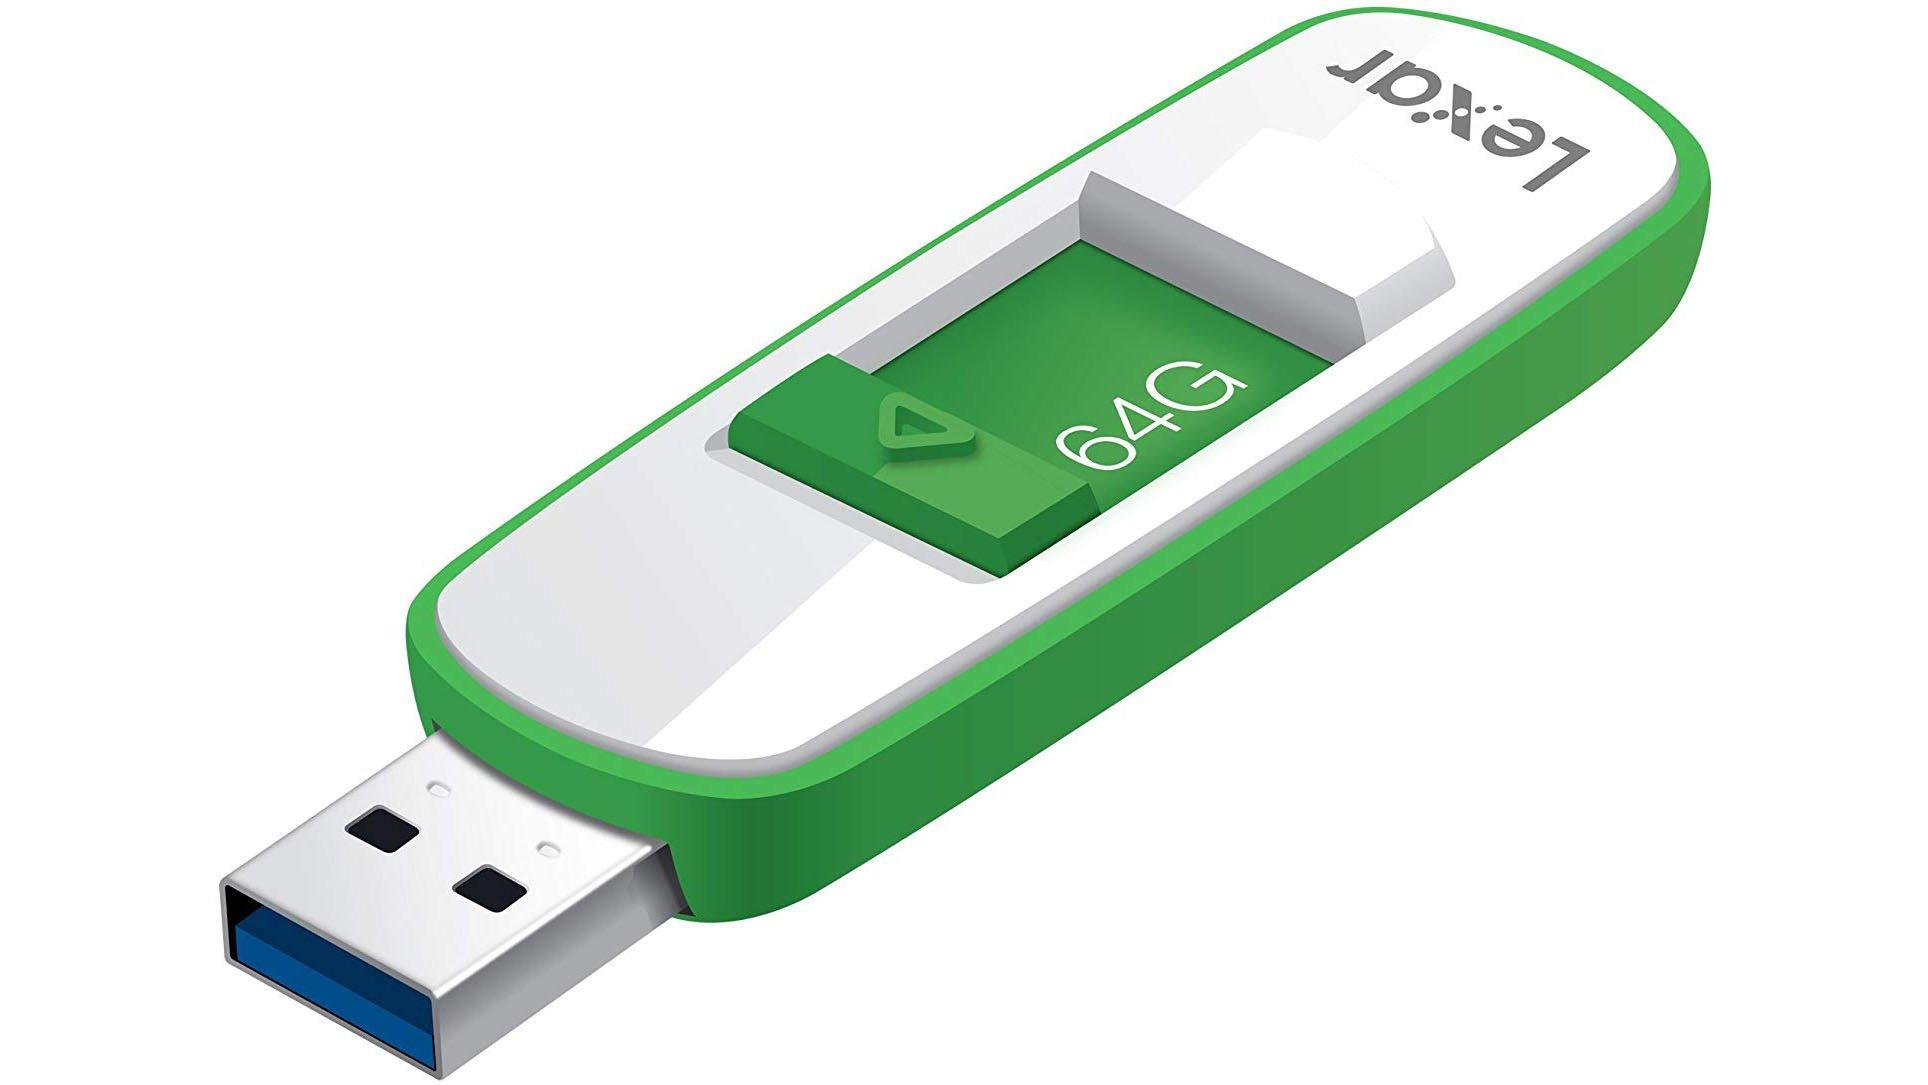 USB Flash Drive 64GB for PC Laptop Desktop Computers Documents Music Storage